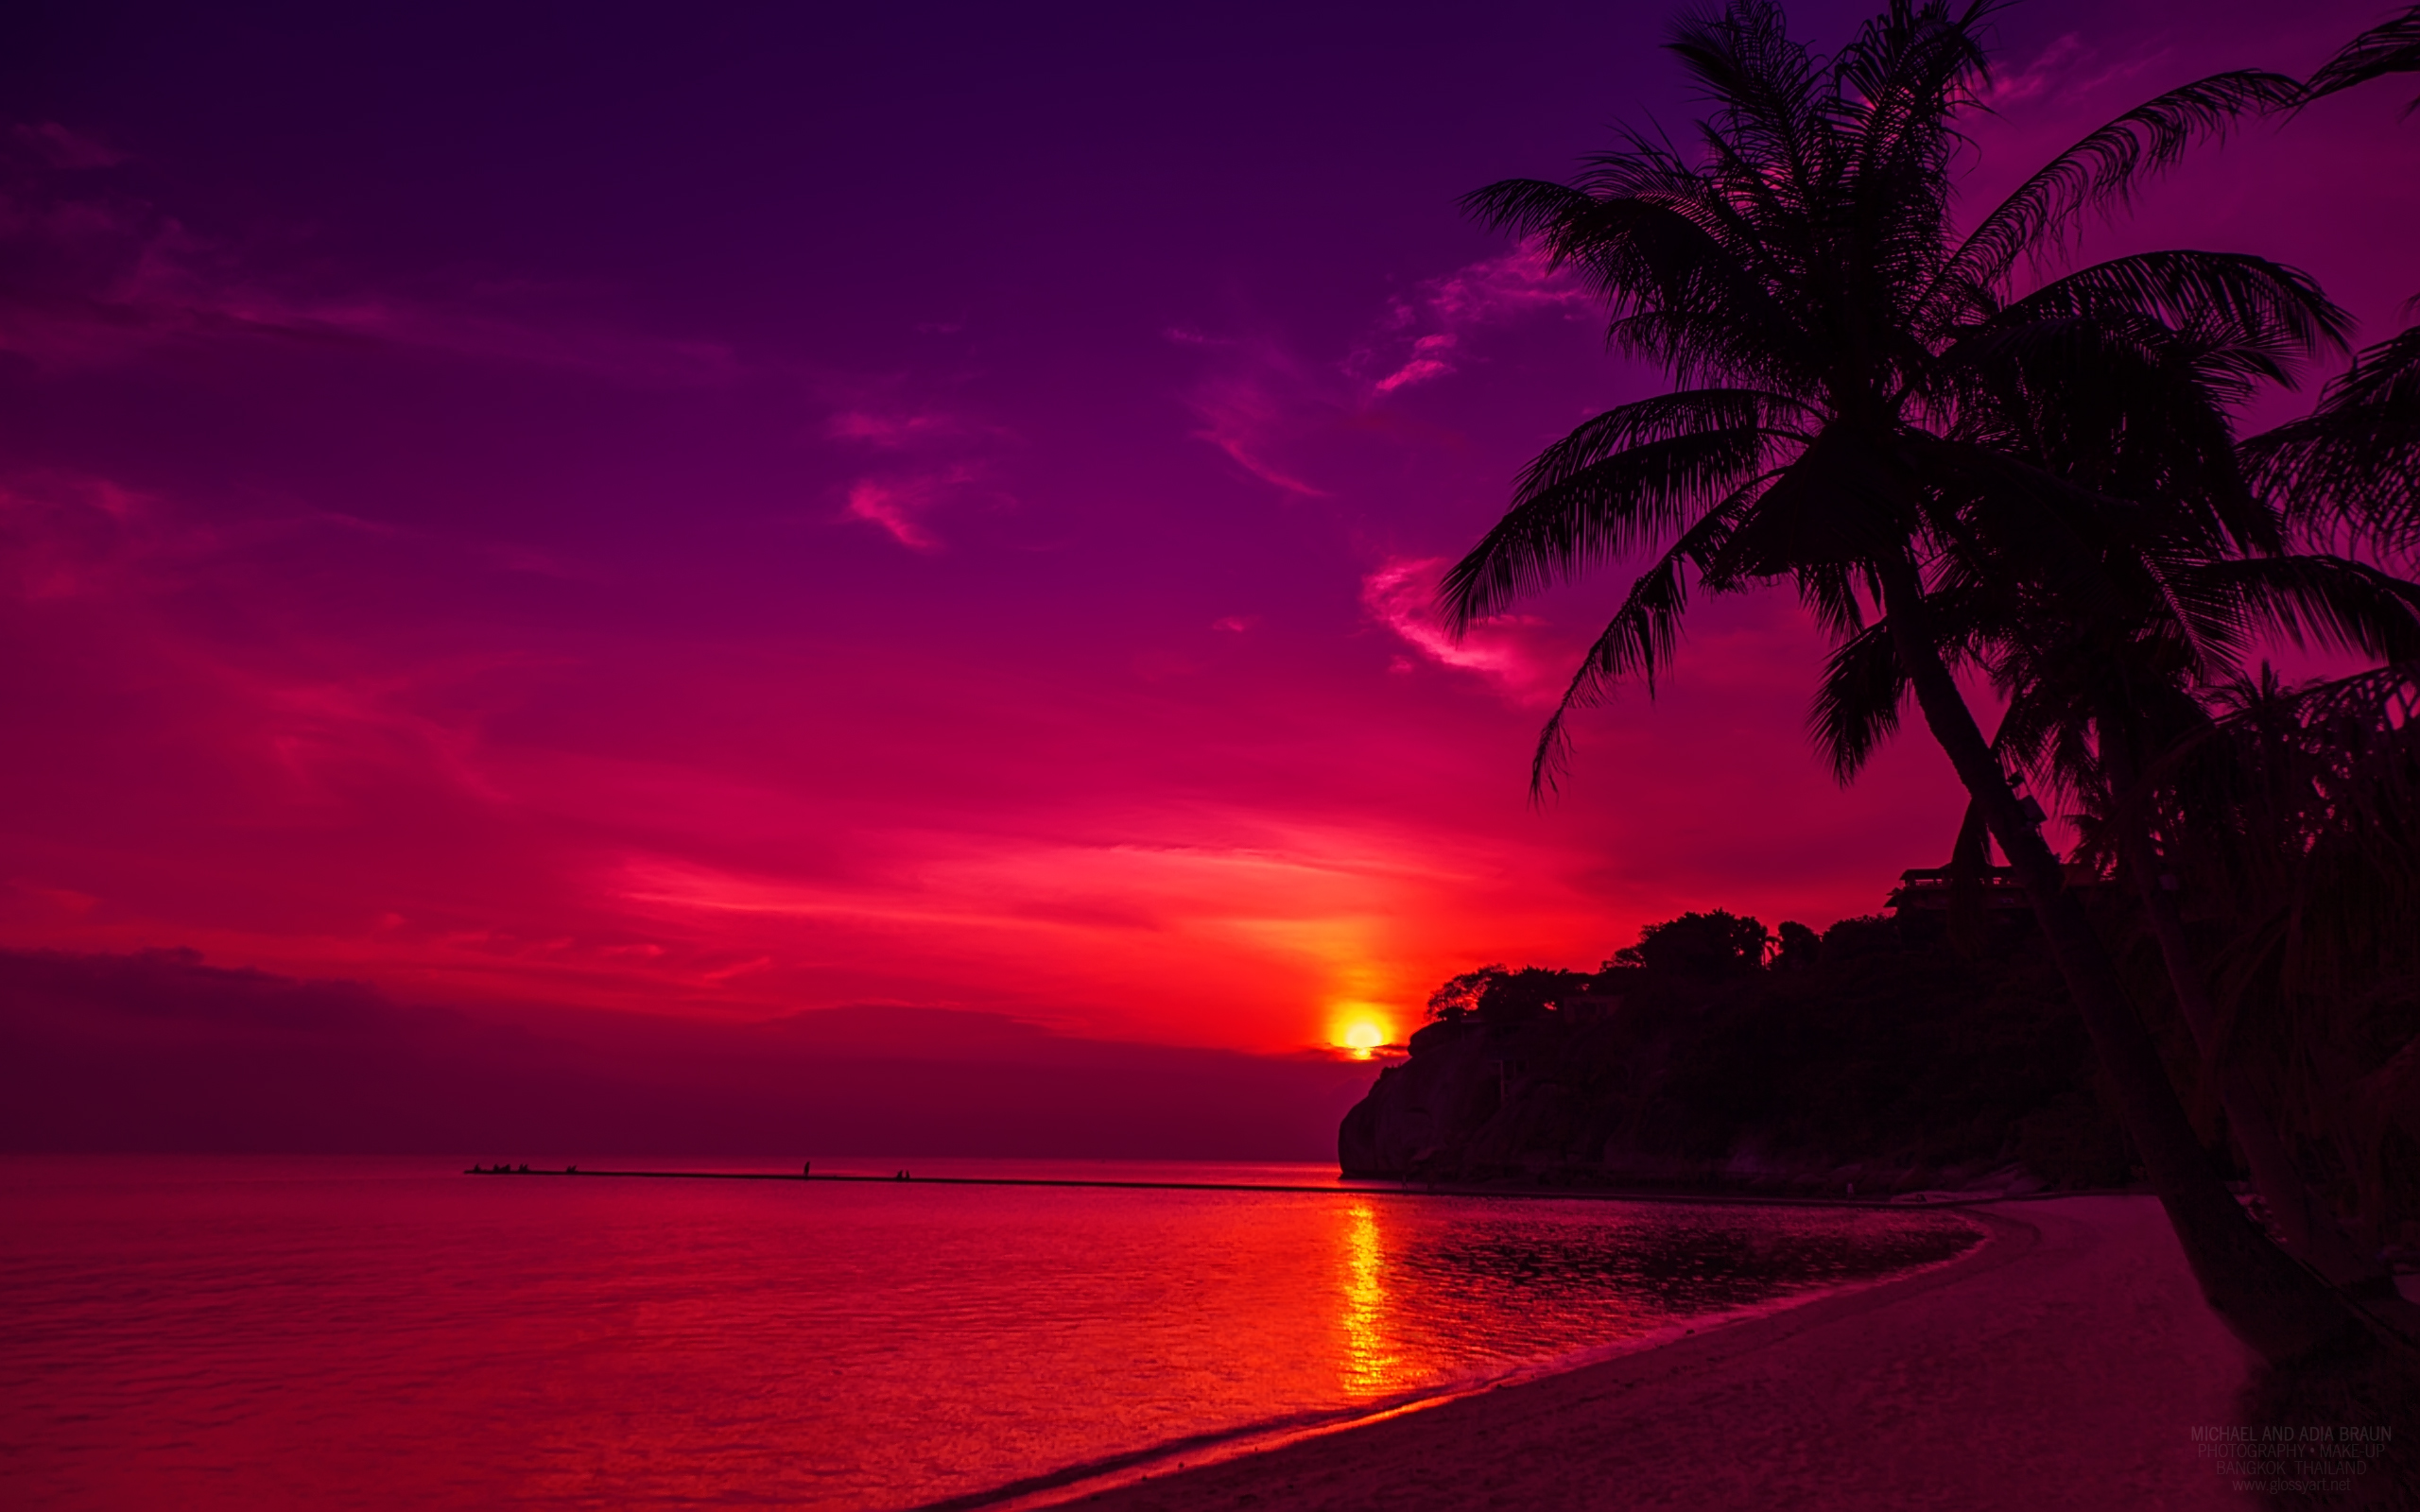 Beautiful Sunset HD Wallpaper Wide Screen Wallpaper 1080p2K4K 2560x1600